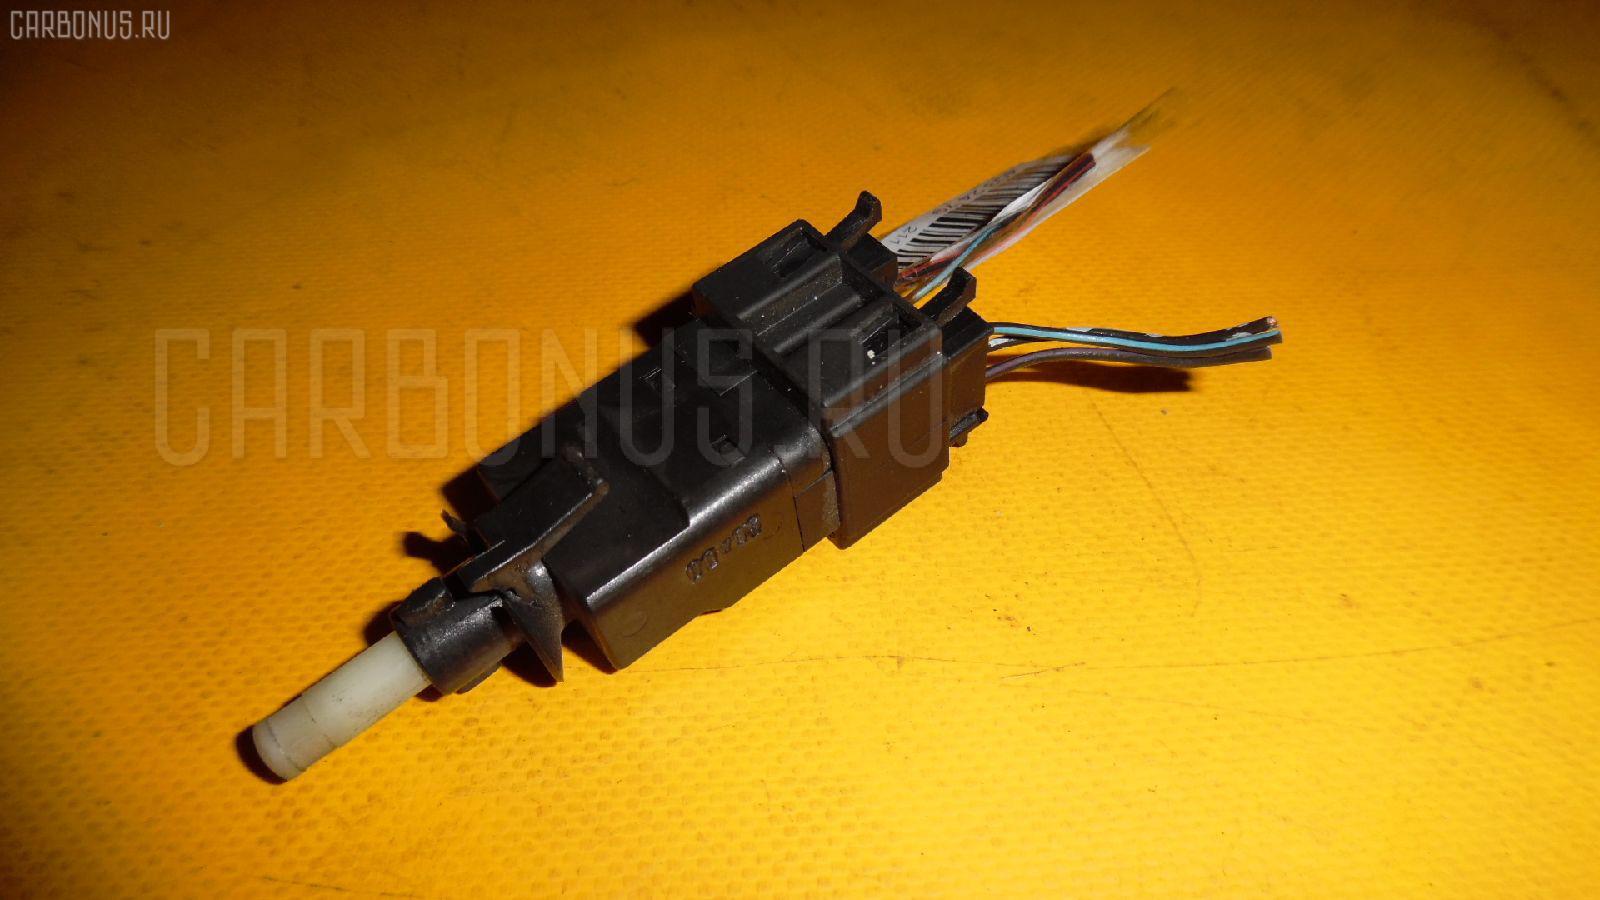 Датчик включения стоп-сигнала MERCEDES-BENZ CL-CLASS C215.375 113.960 Фото 3